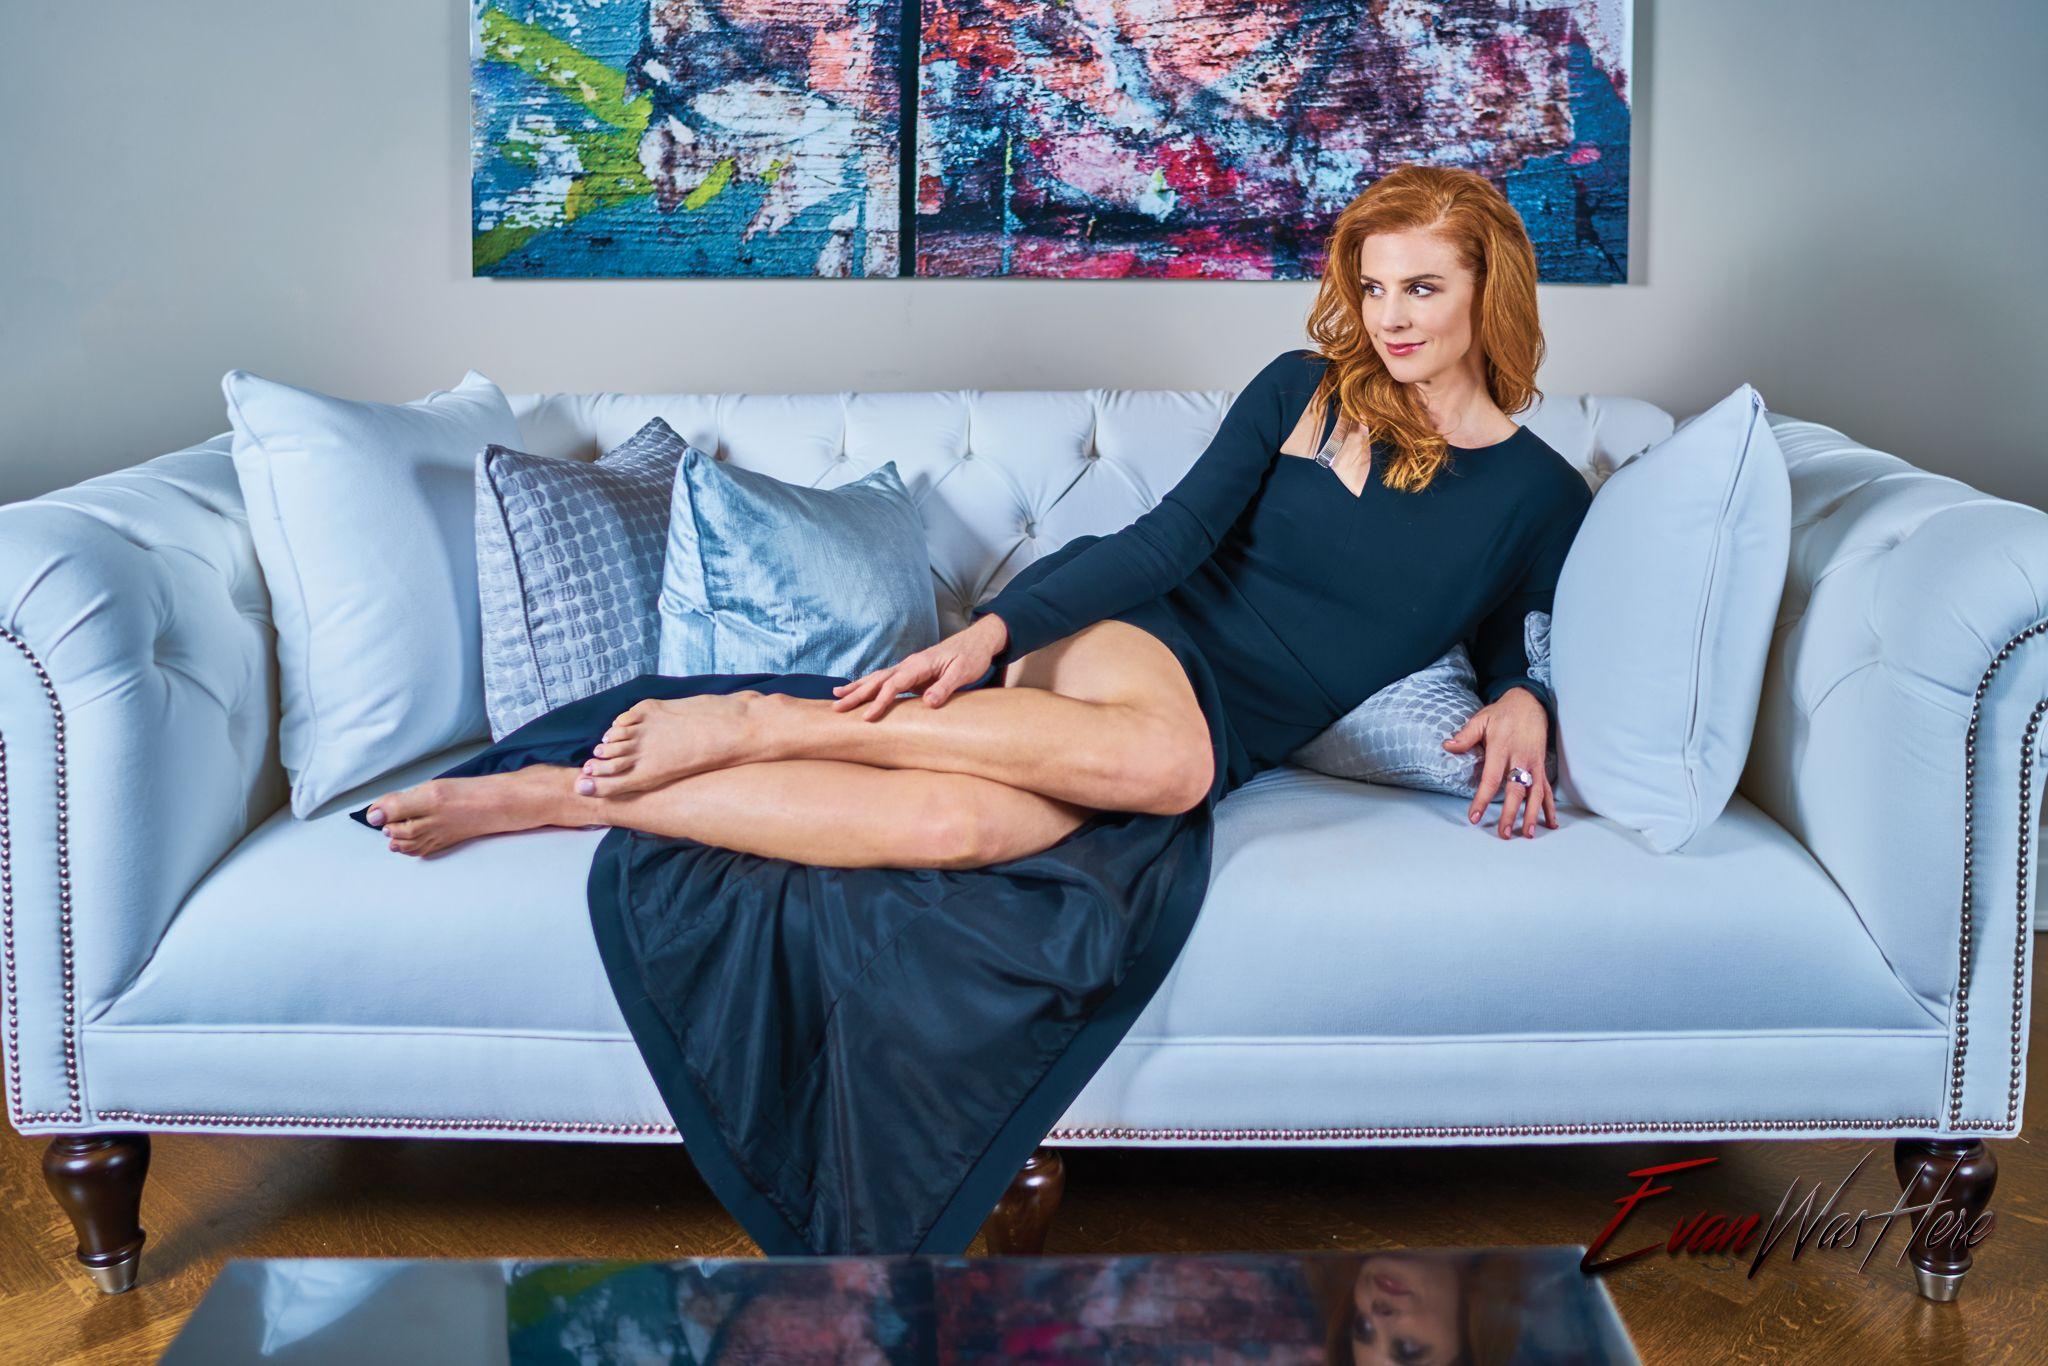 Sarah Rafferty Natural Beauty Descalzo Pelirrojas Y Belleza